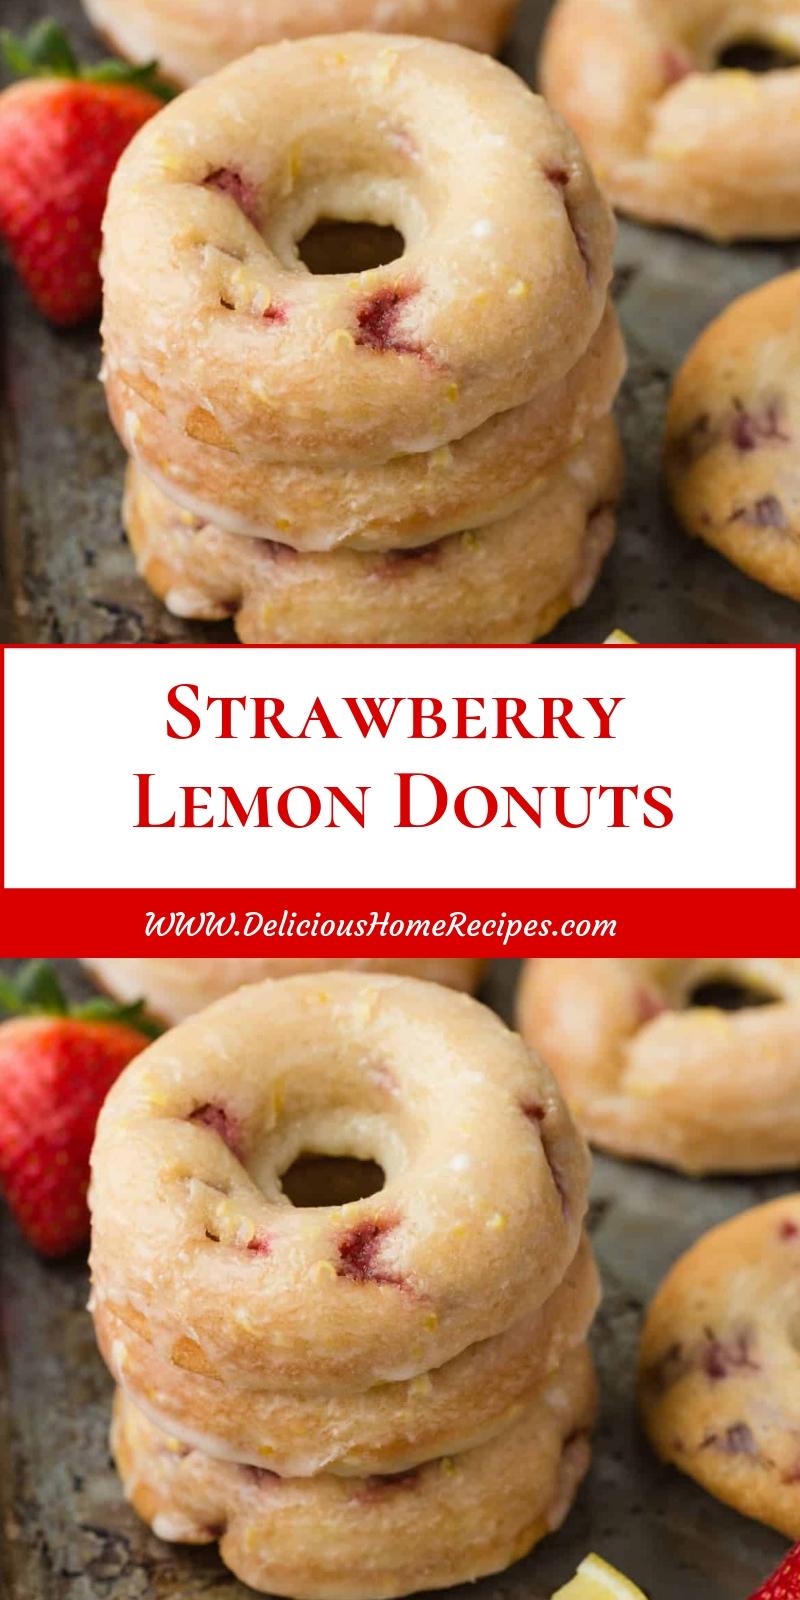 Strawberry Lemon Donuts